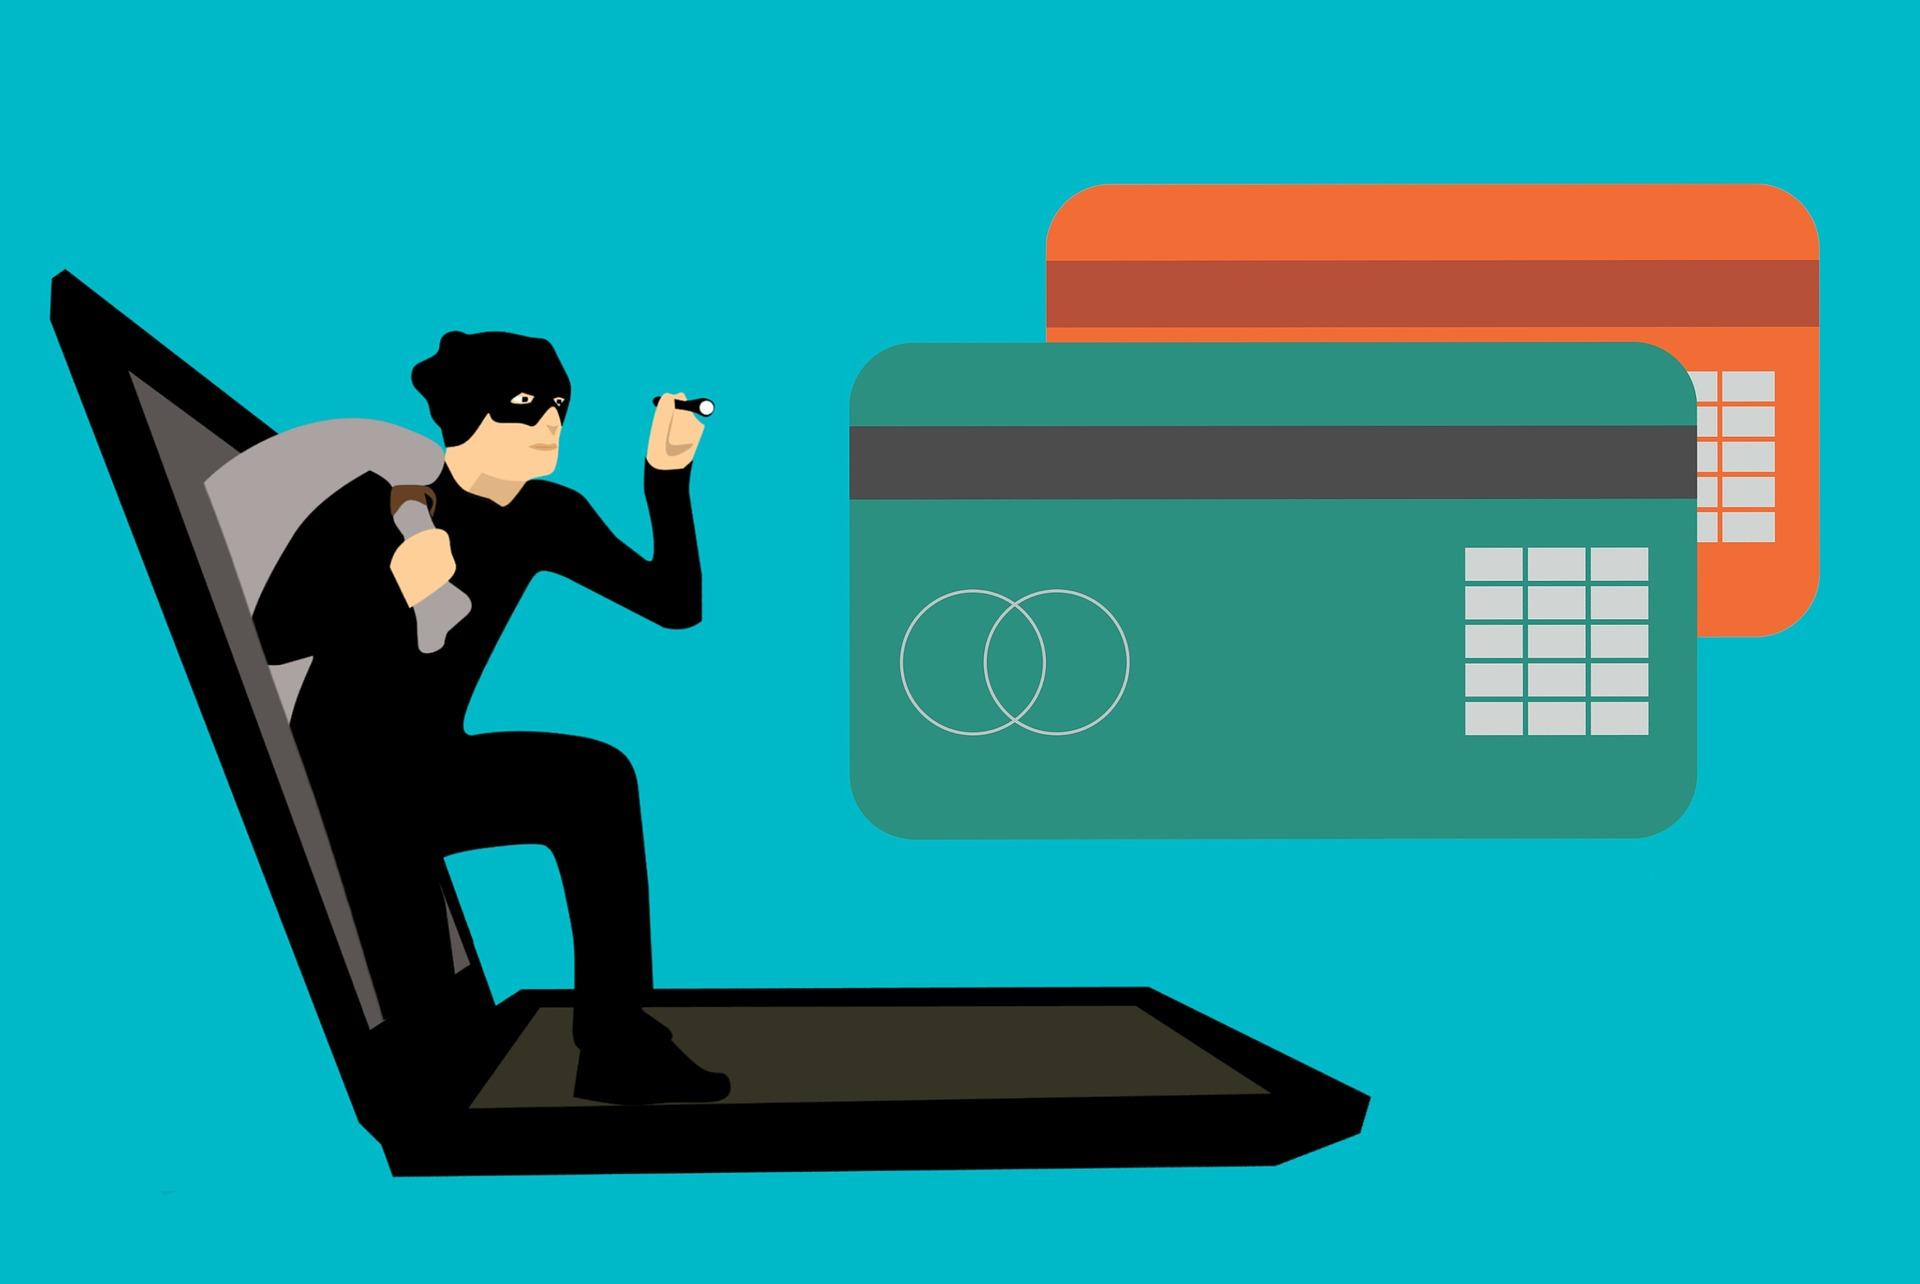 Is Goshoping Store a Scam or Untrustworthy Online Shop?